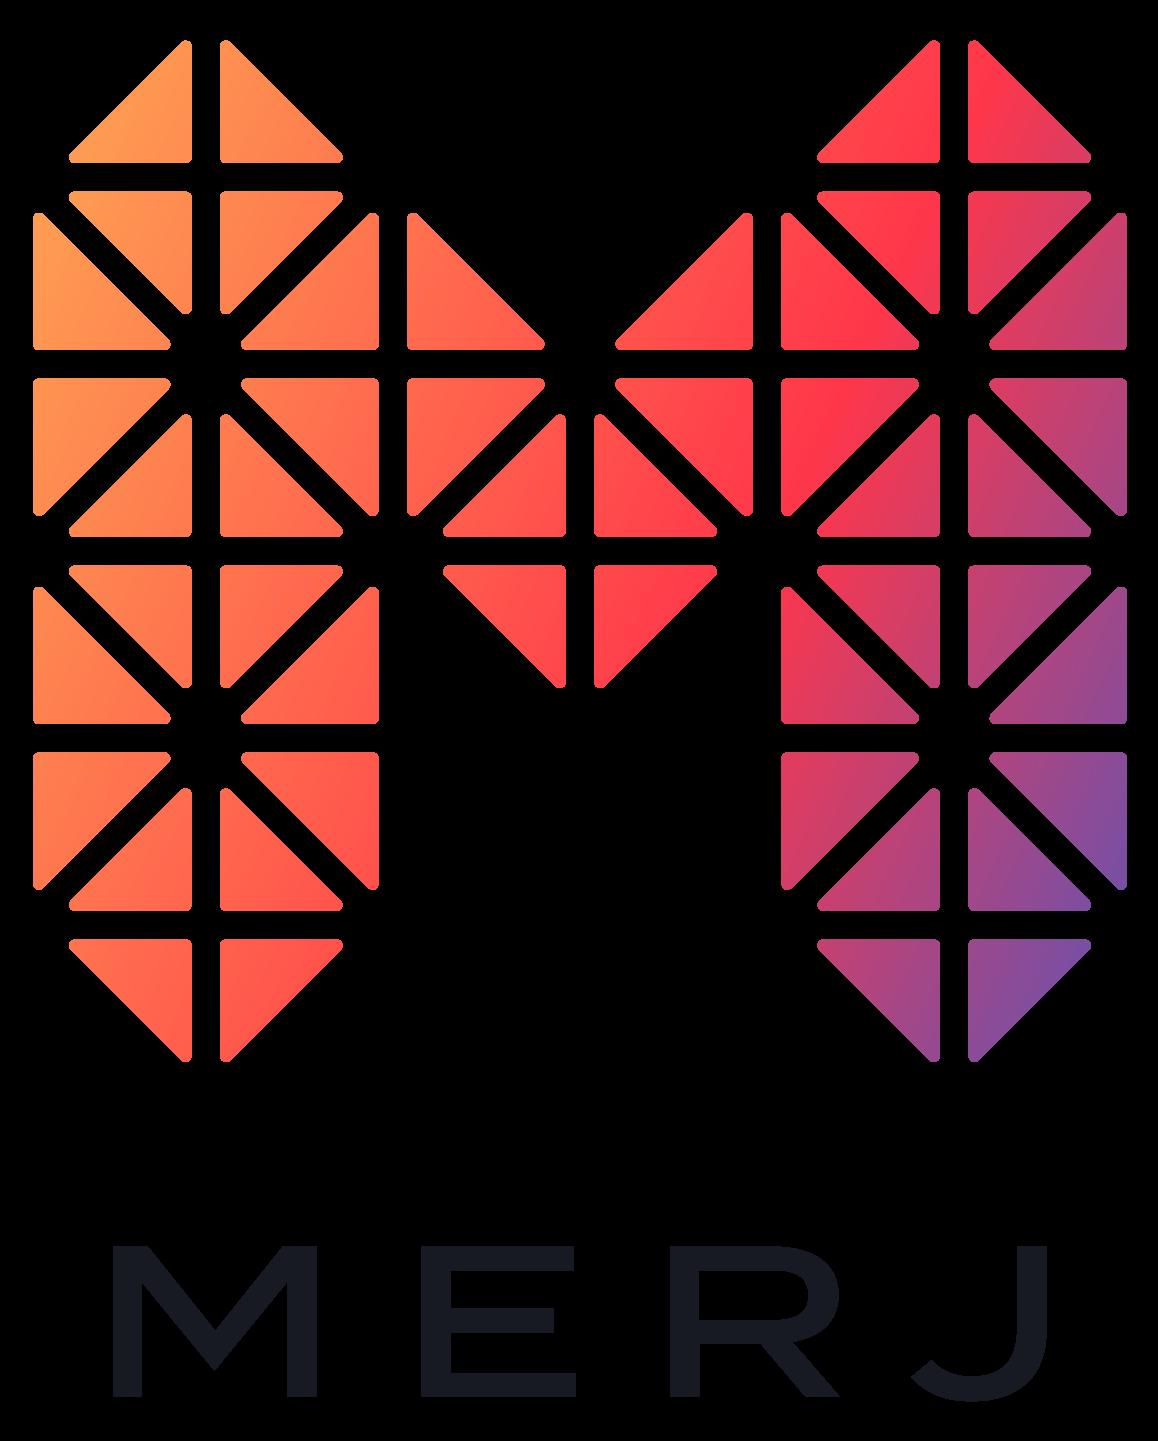 Merj logo